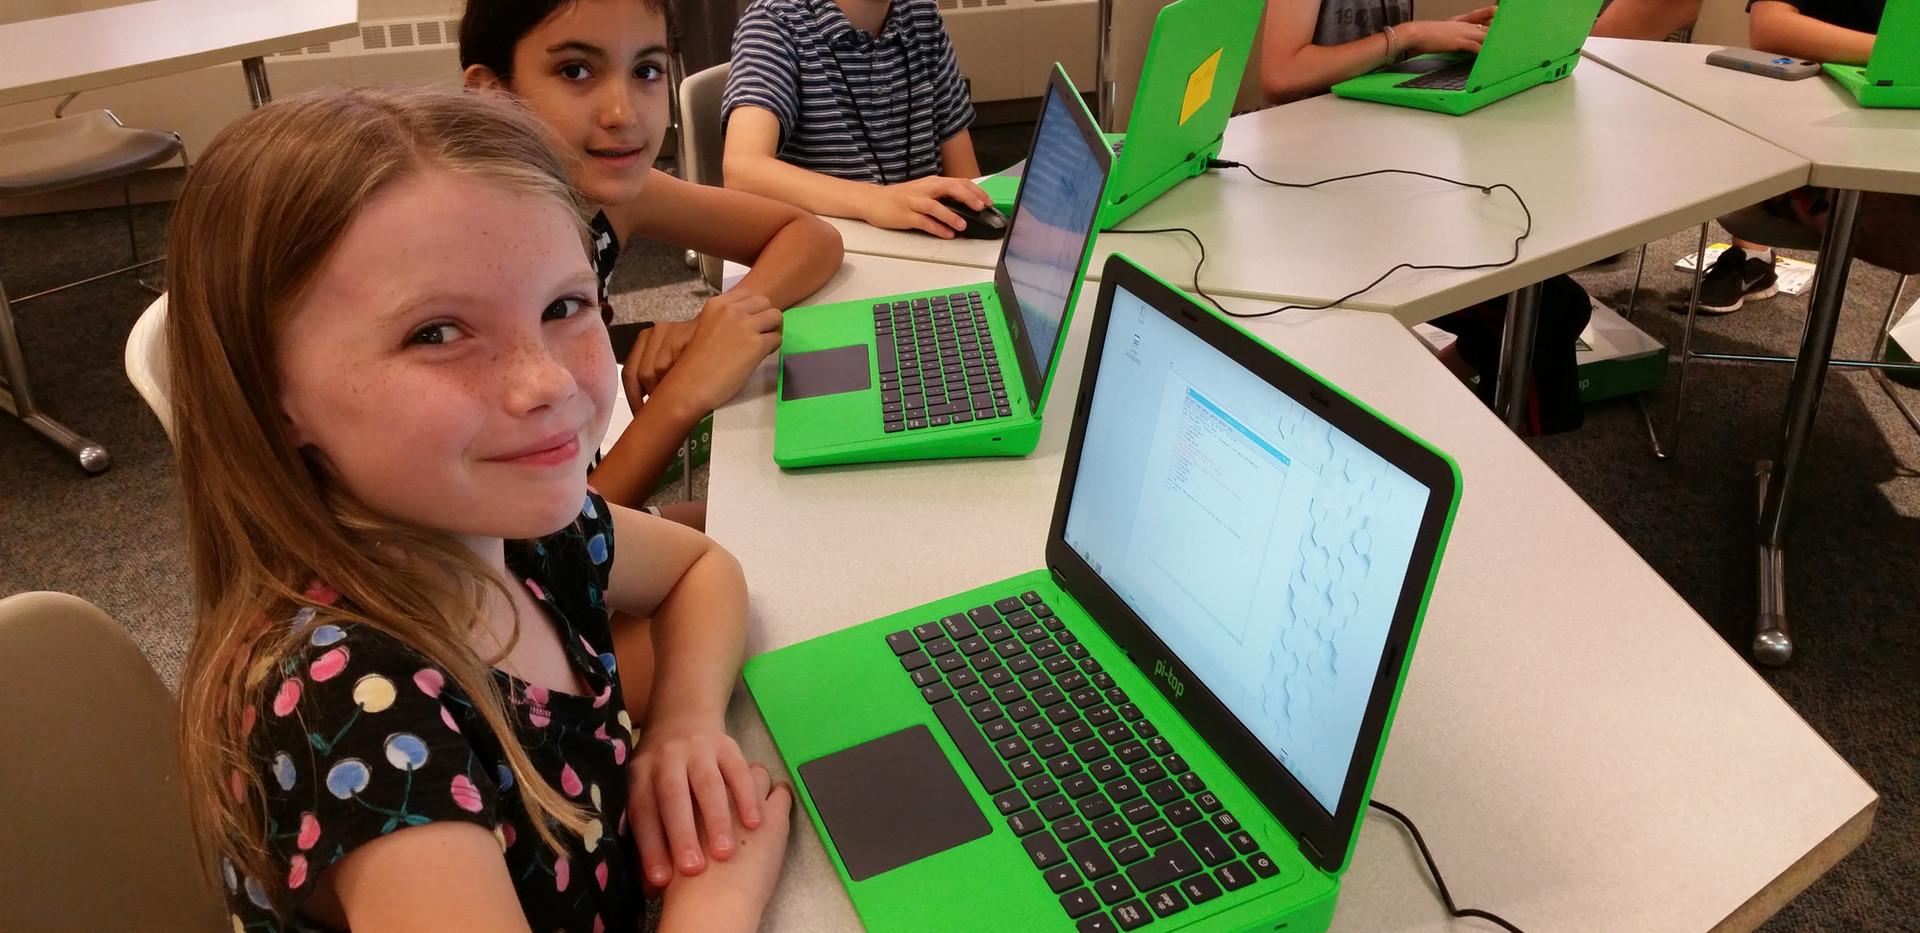 Build Your Own Laptop 2018